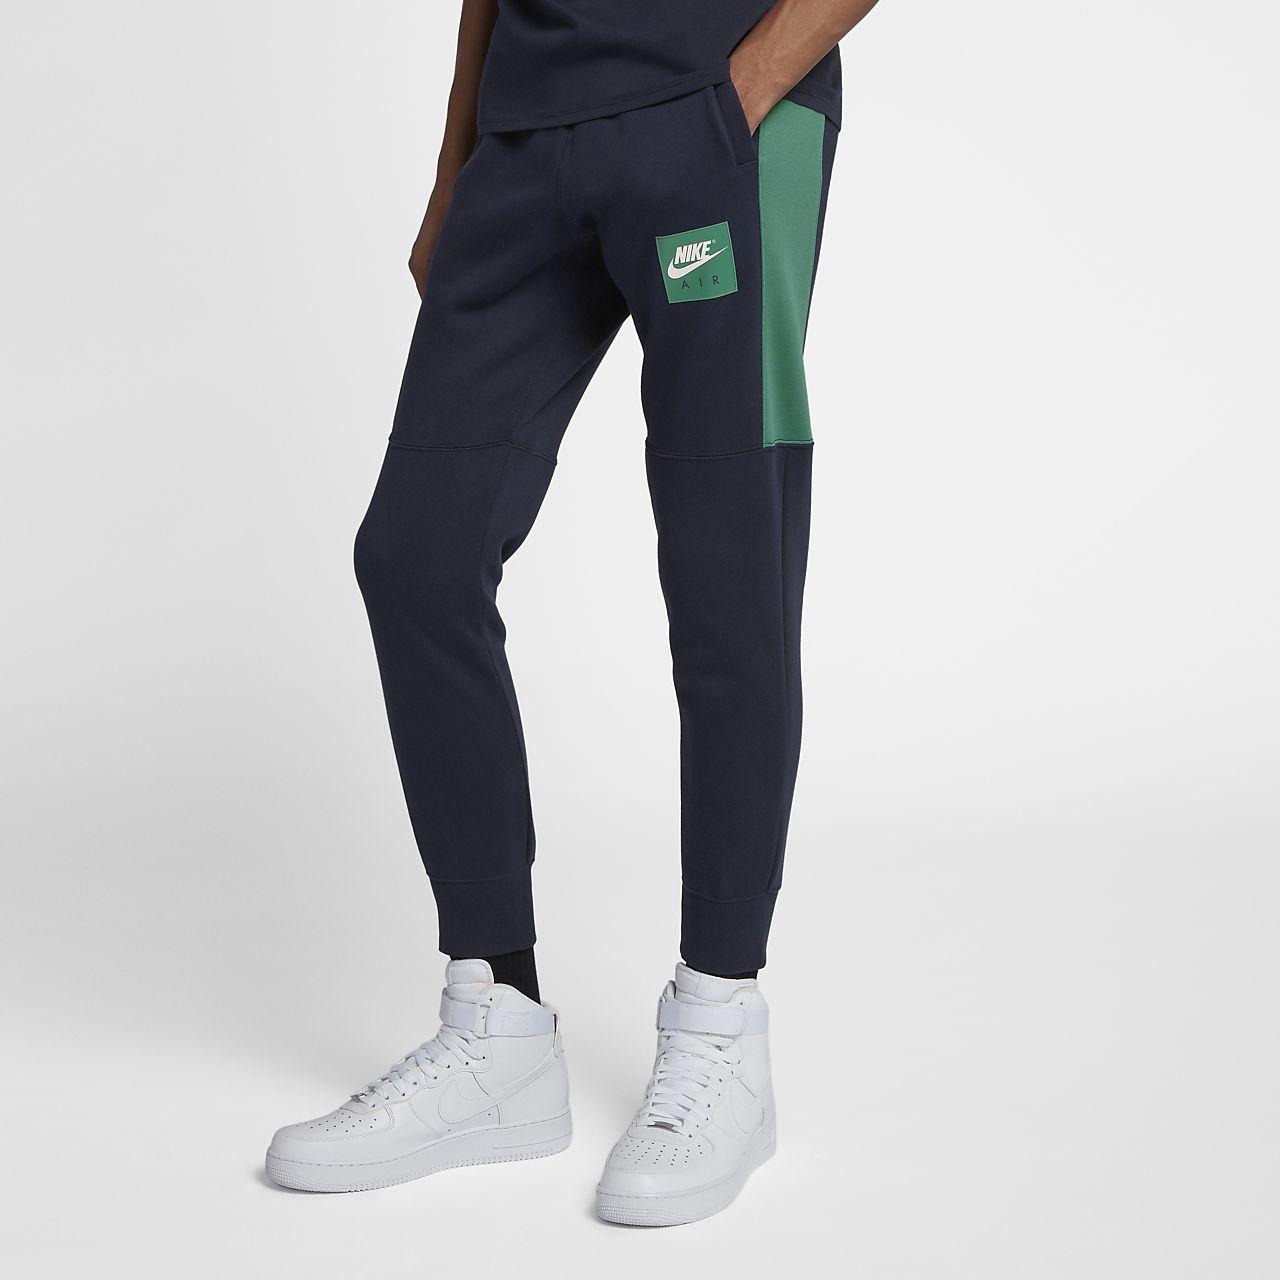 ... Nike Air Men's Fleece Joggers